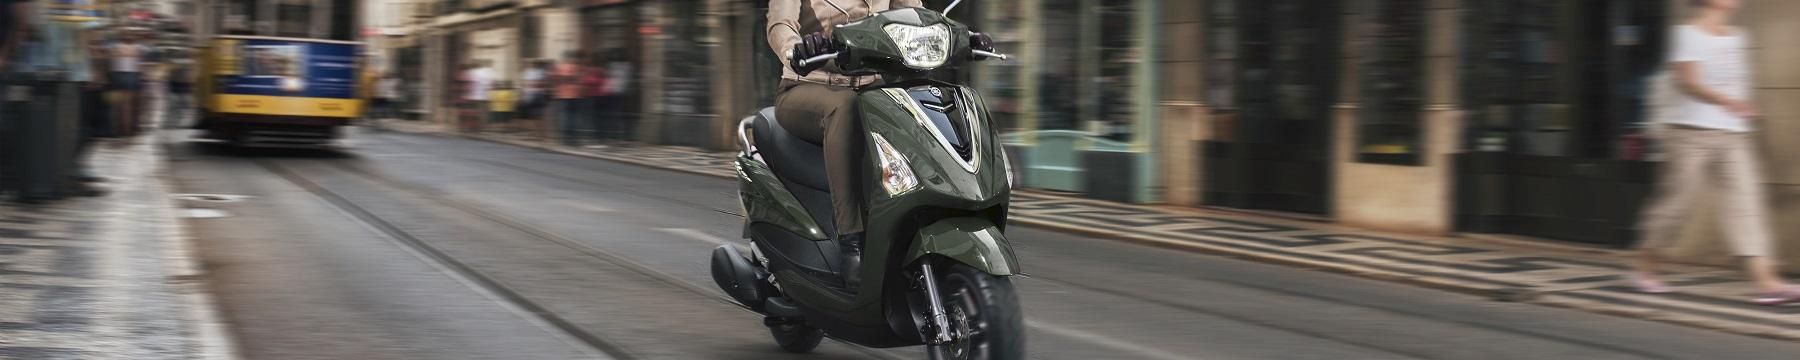 Yamaha D'elight - MotorCentrumWest